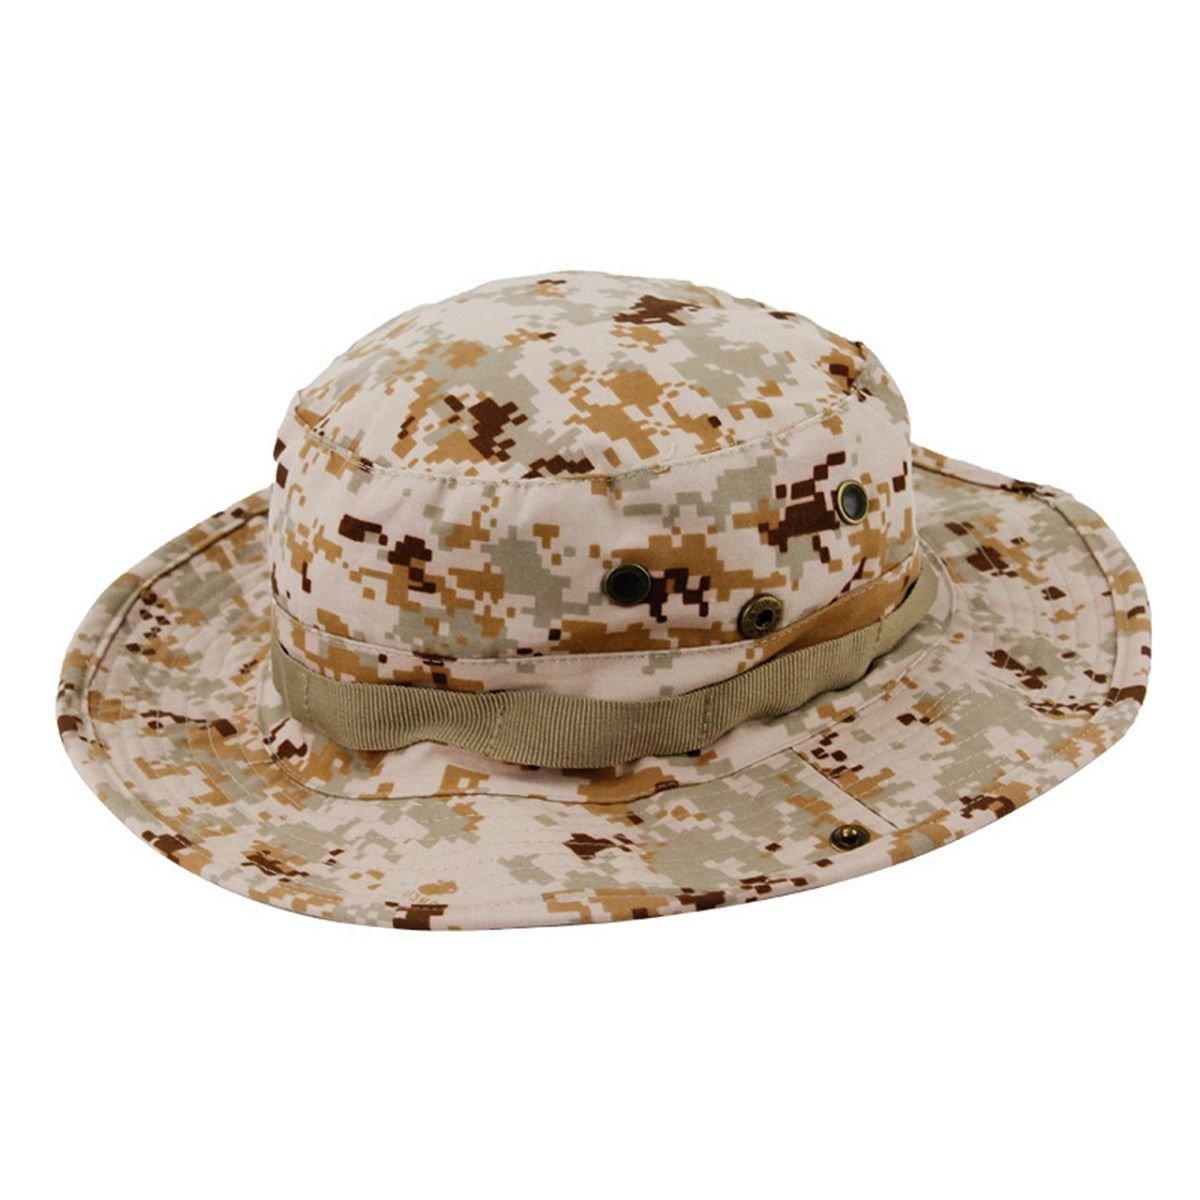 New Infantry Camoflage Boonie Hat Outdoor Sport Bush Patrol Combat Cap Cotton